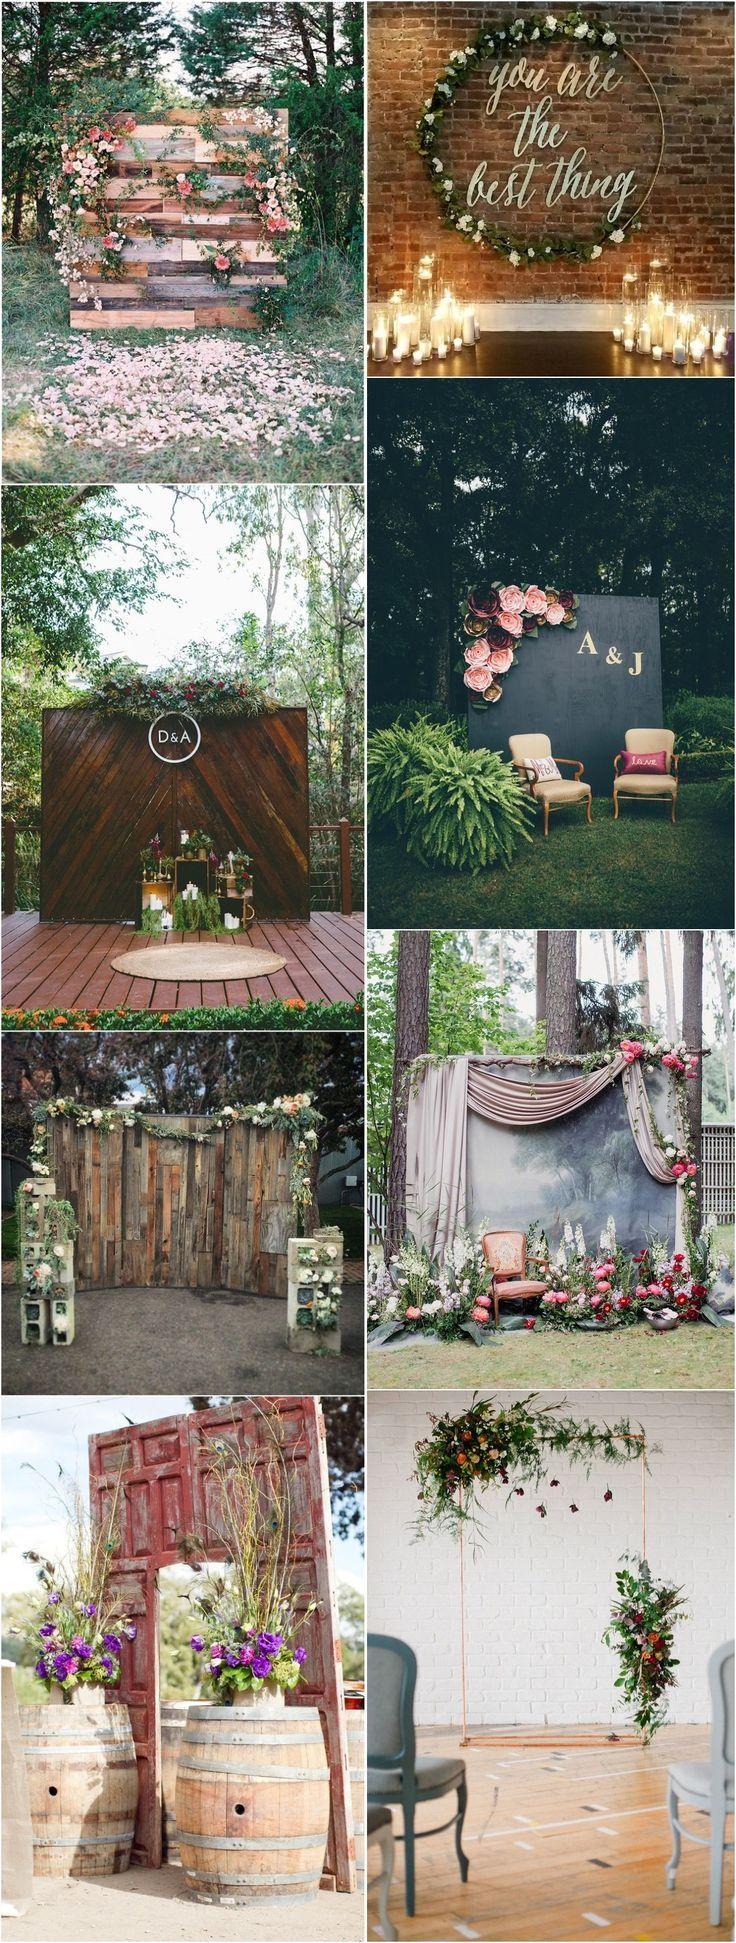 Unique Wedding Ideas Wedding Backdrop Ideas Http Www Deerpearlflowers Com We Vintage Wedding Backdrop Diy Wedding Backdrop Wedding Reception Centerpieces